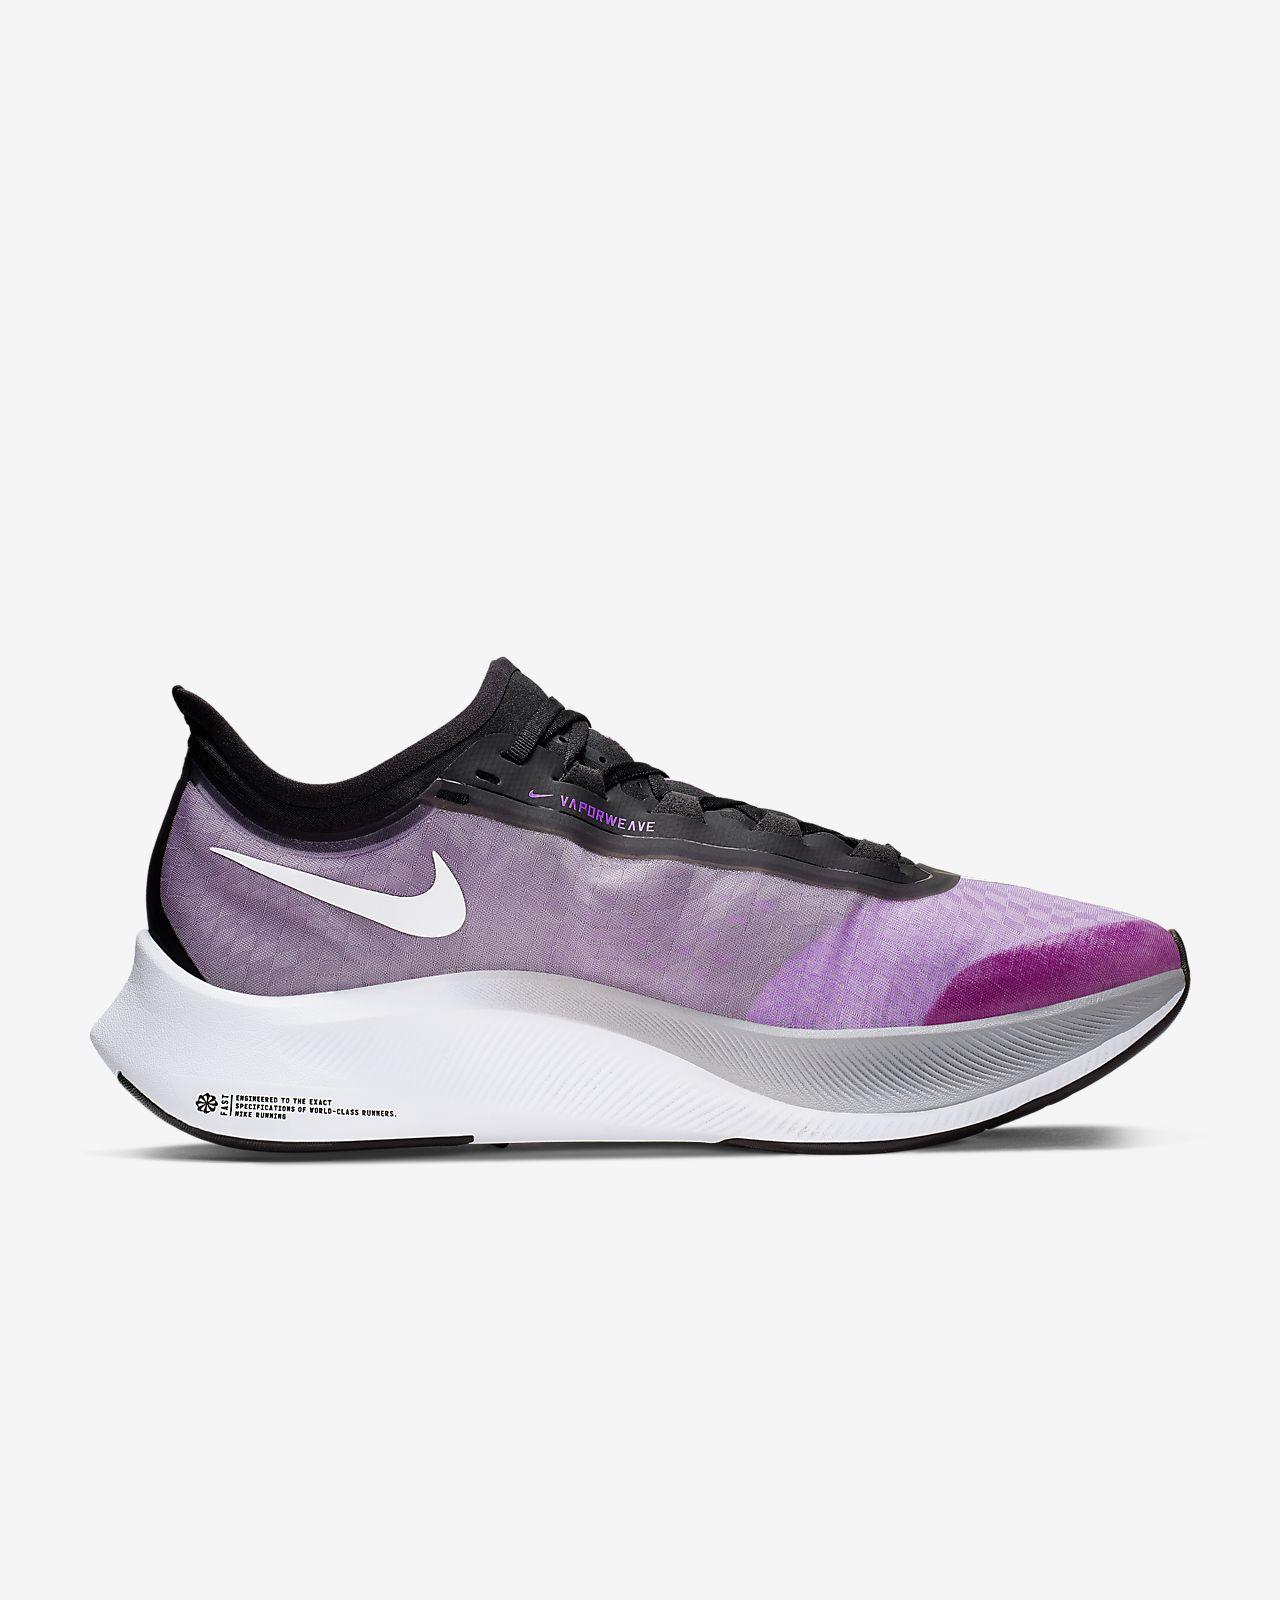 low price promo codes uk cheap sale Nike Zoom Fly 3 Men's Running Shoe